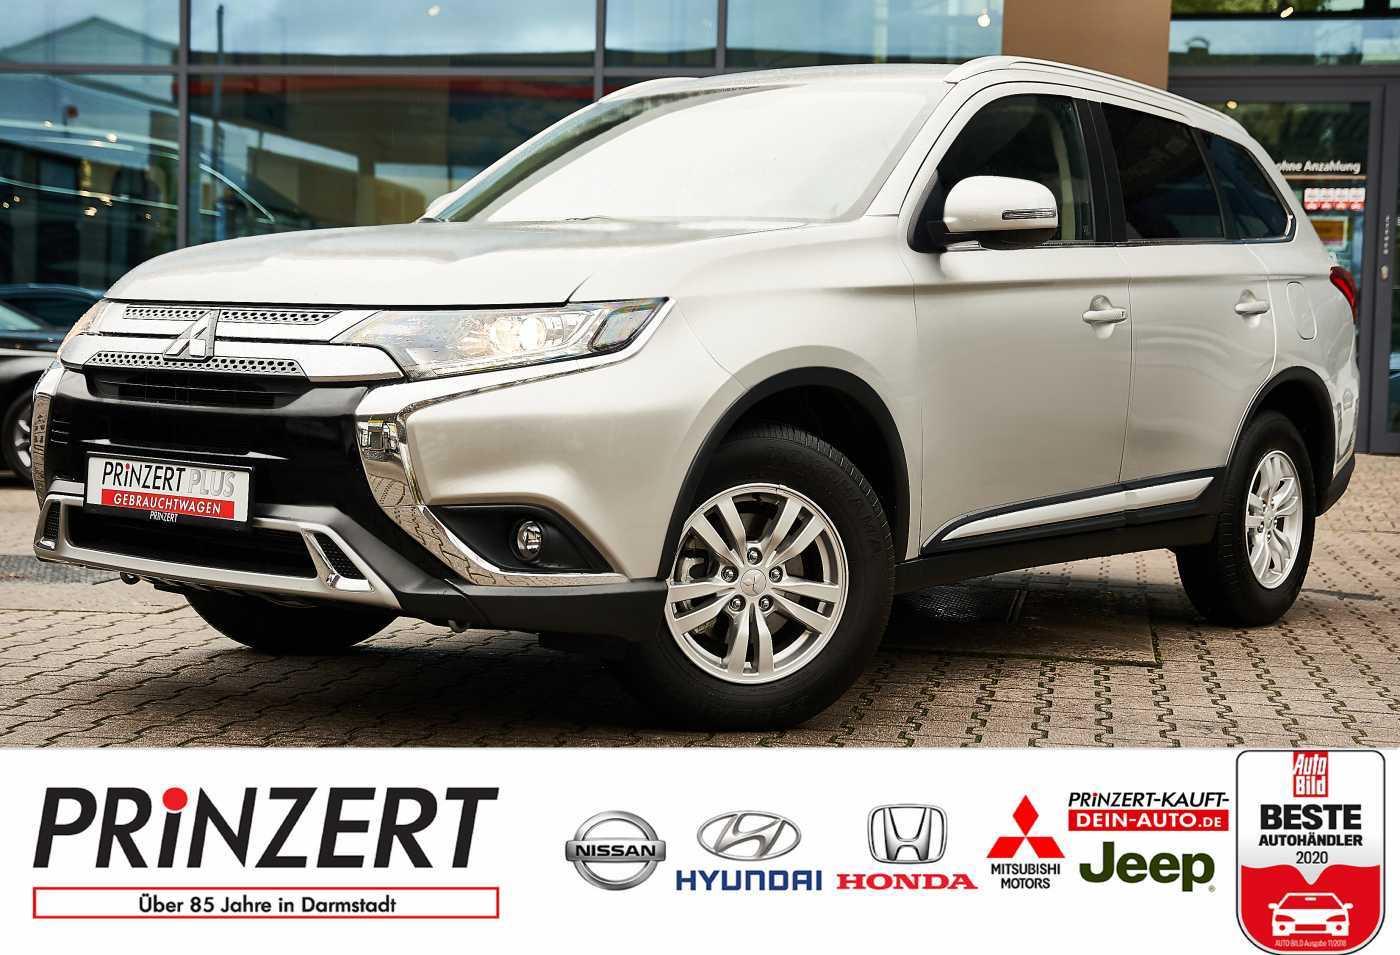 Mitsubishi Outlander 2.0 MT 2WD 'Active' Euro 6Dtemp, Jahr 2020, Benzin